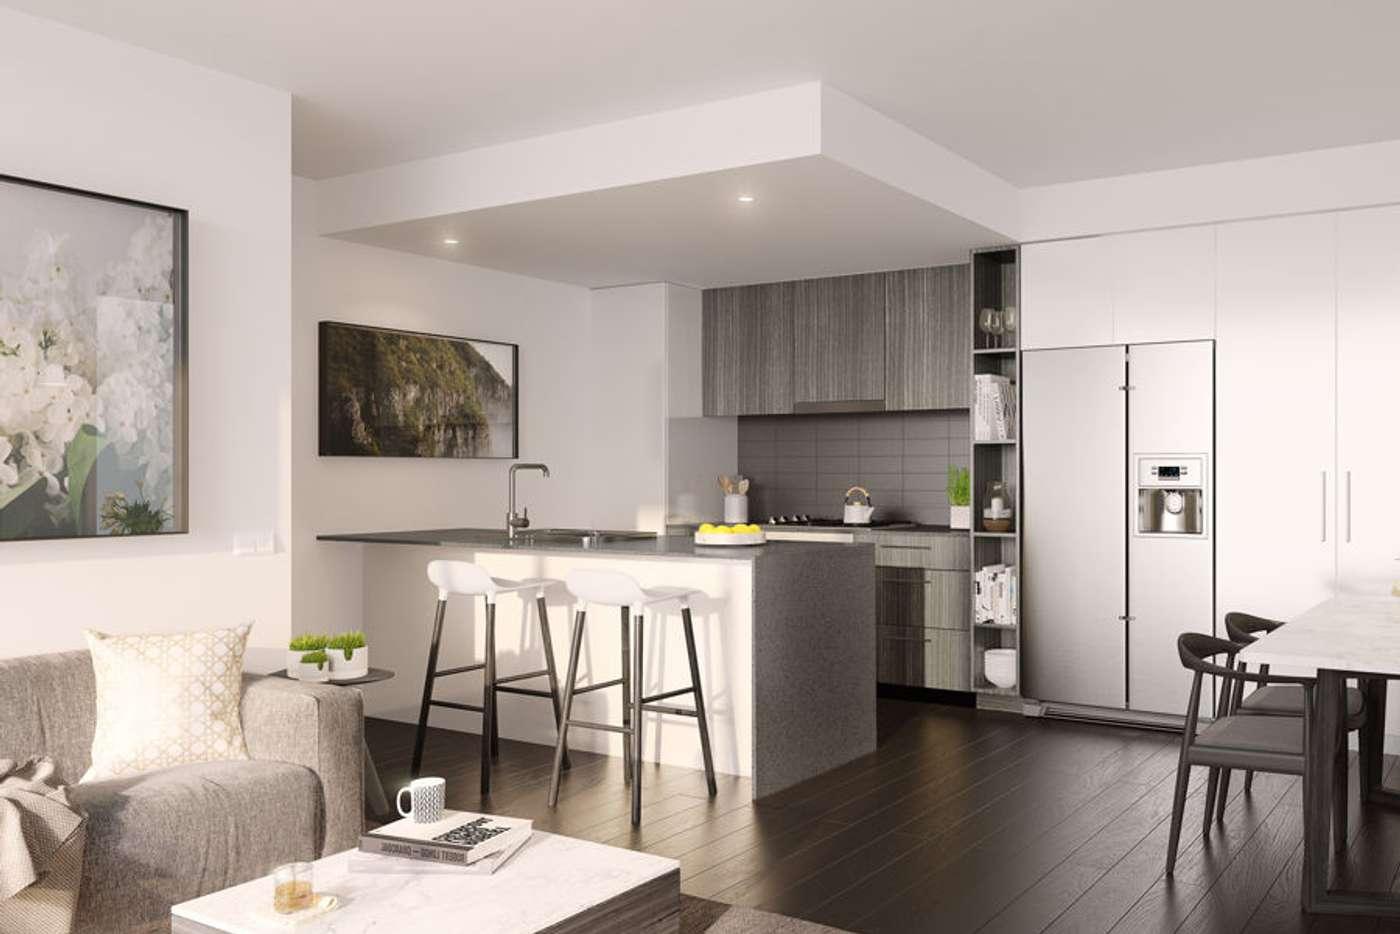 Main view of Homely apartment listing, 101 / 65-67 Tyron Street, Mount Gravatt QLD 4122